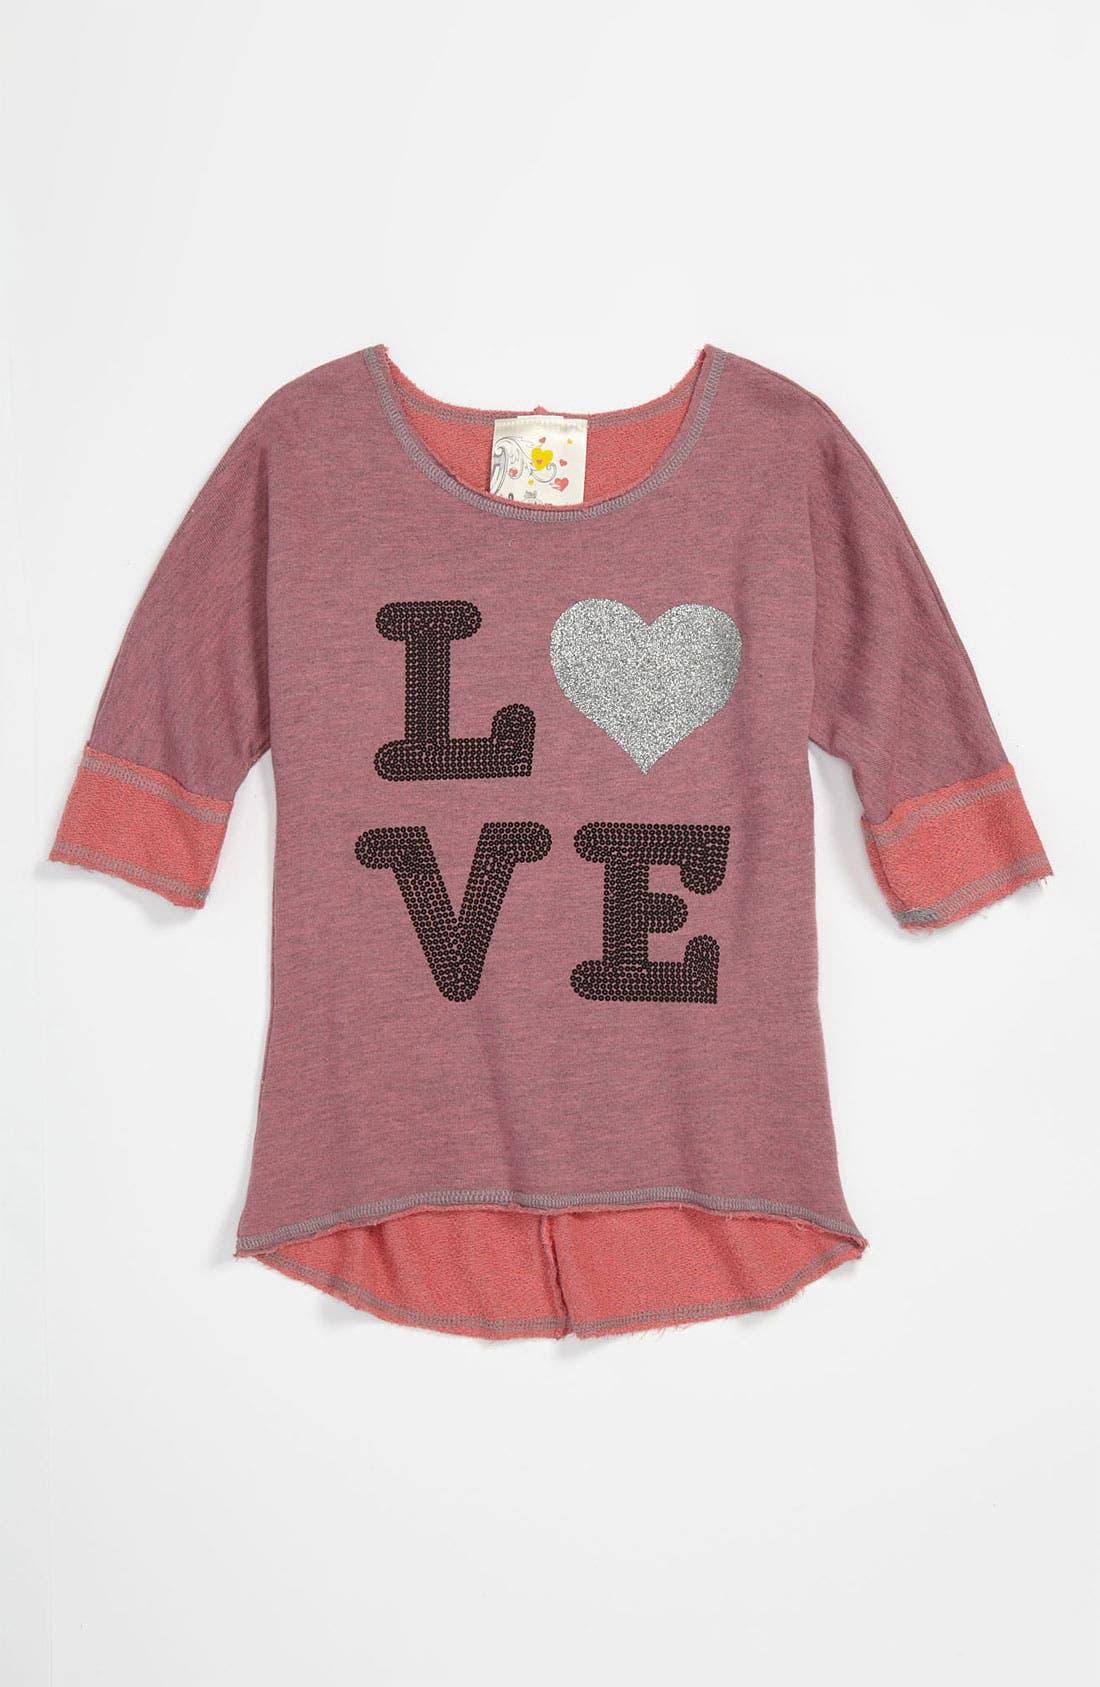 Alternate Image 1 Selected - Jenna & Jessie 'Love' Tunic (Little Girls)